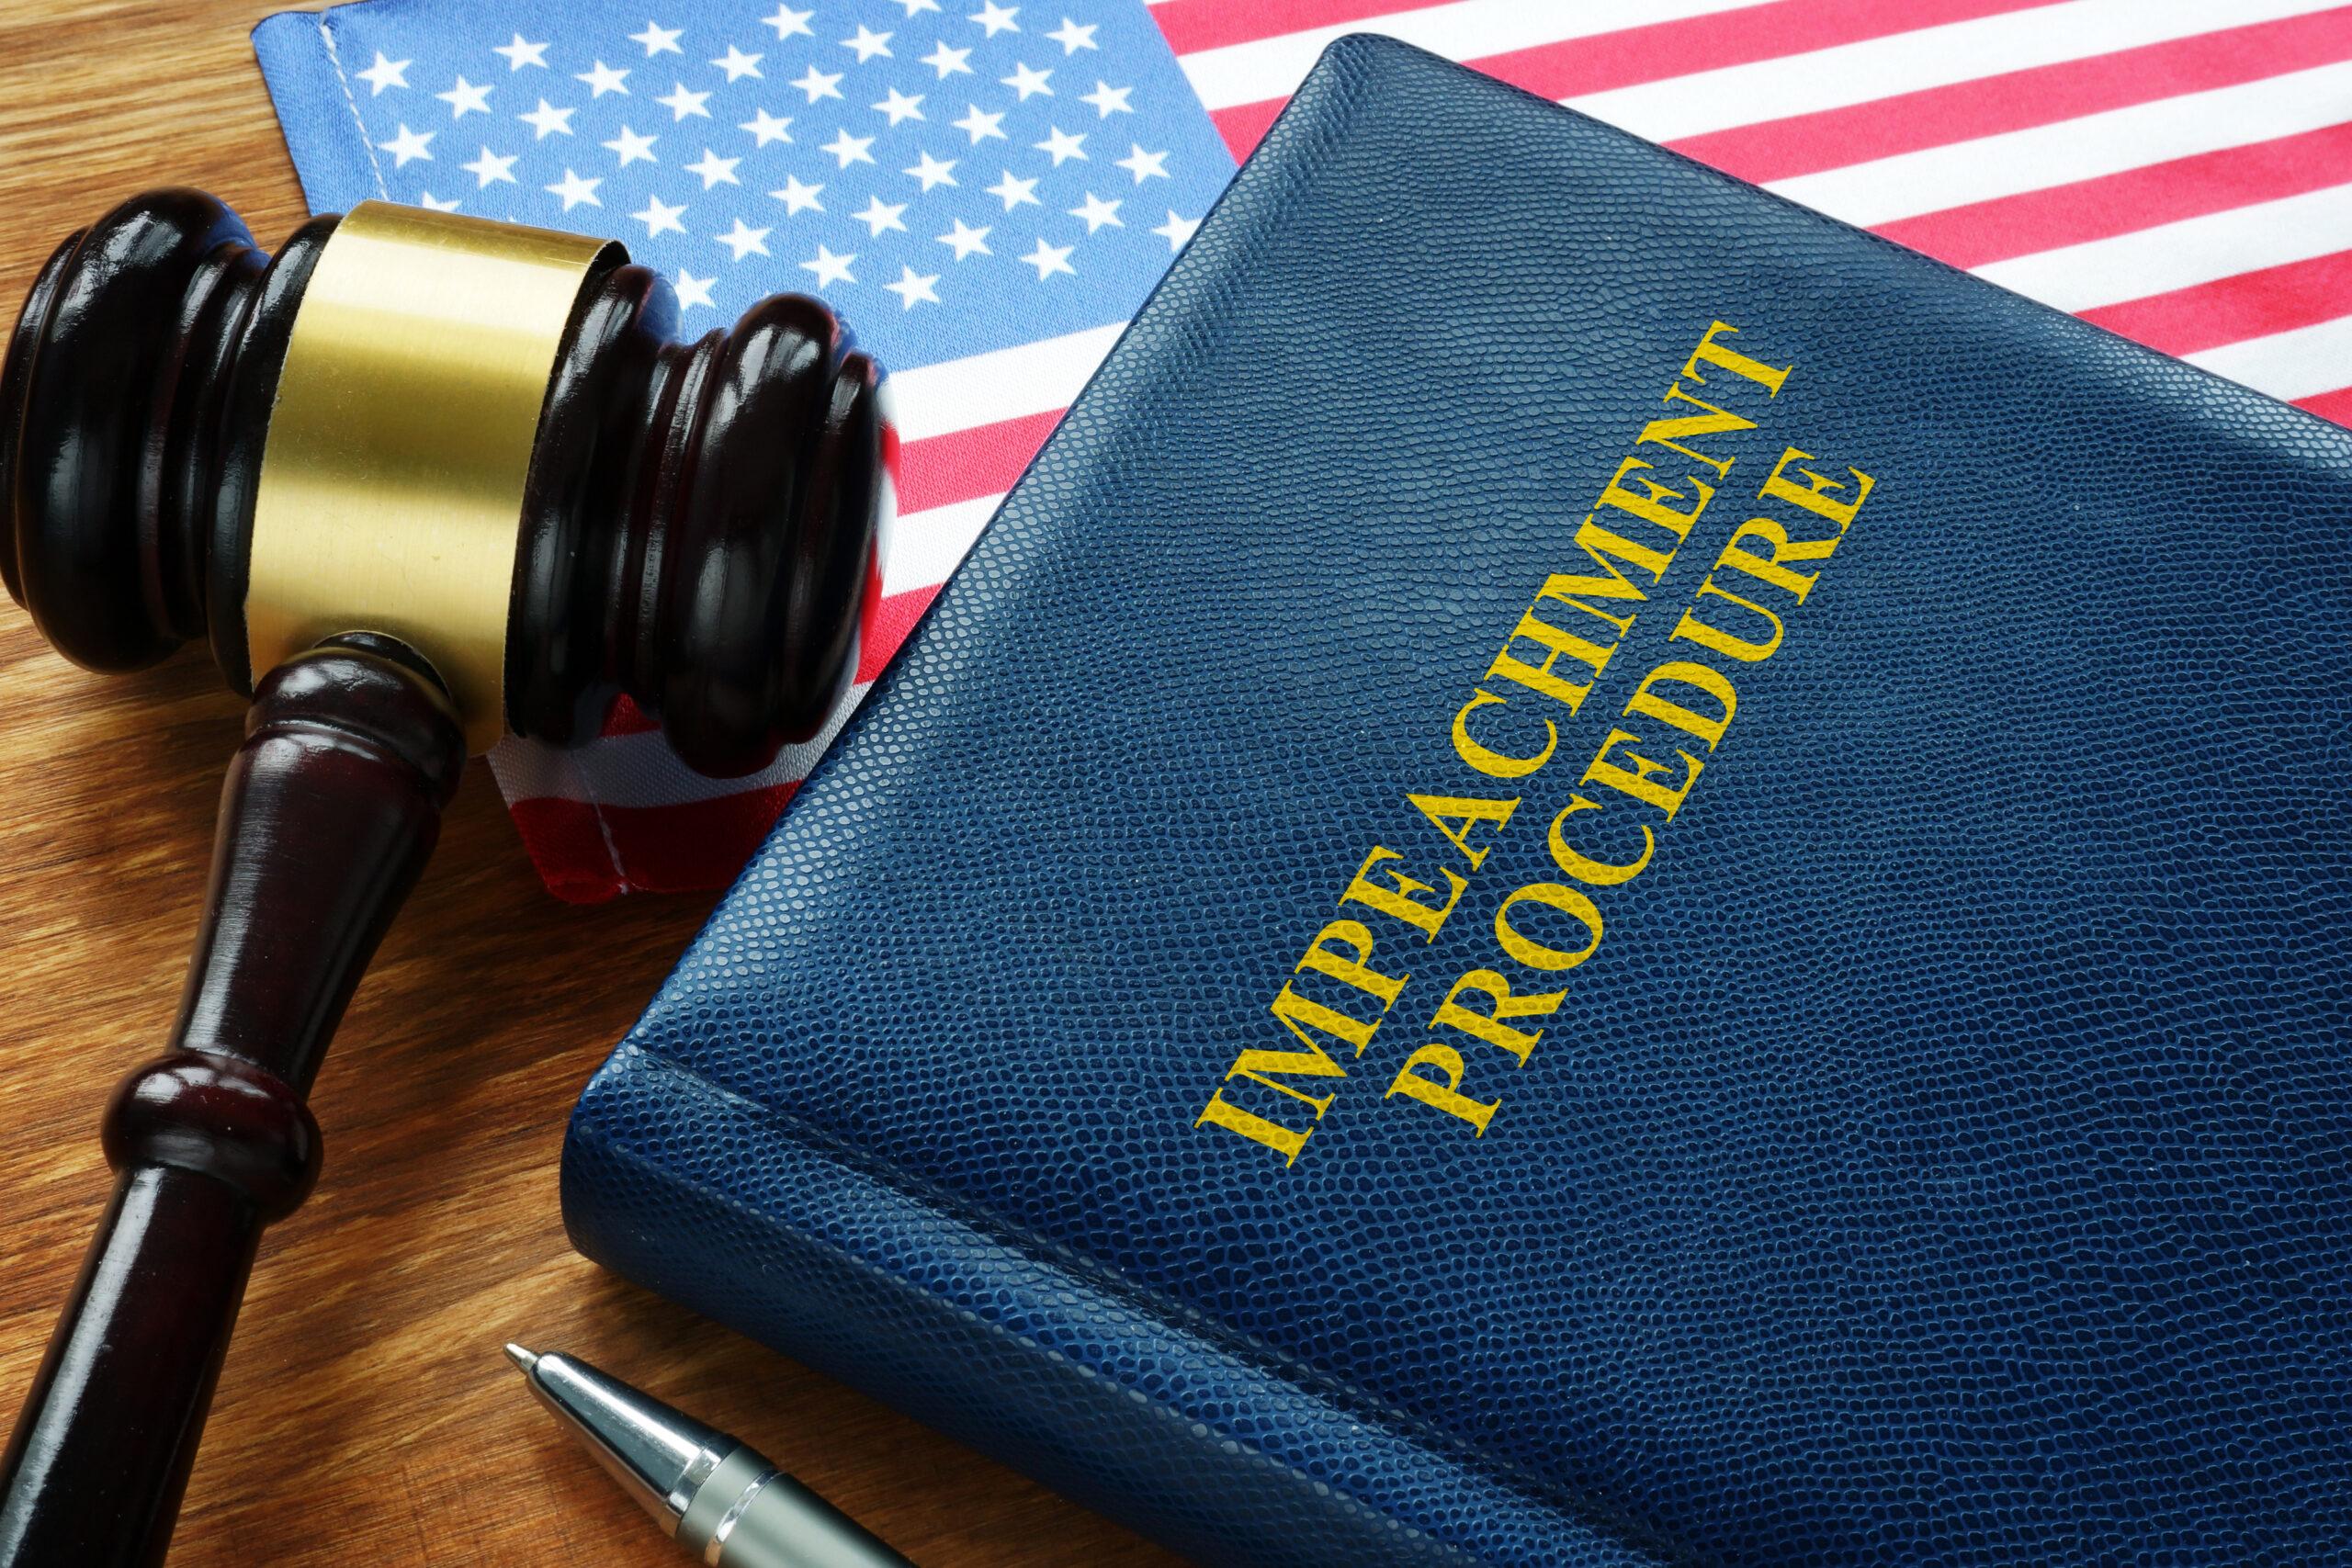 Impeachment procedure law, gavel and USA flag. Image credit: iStock